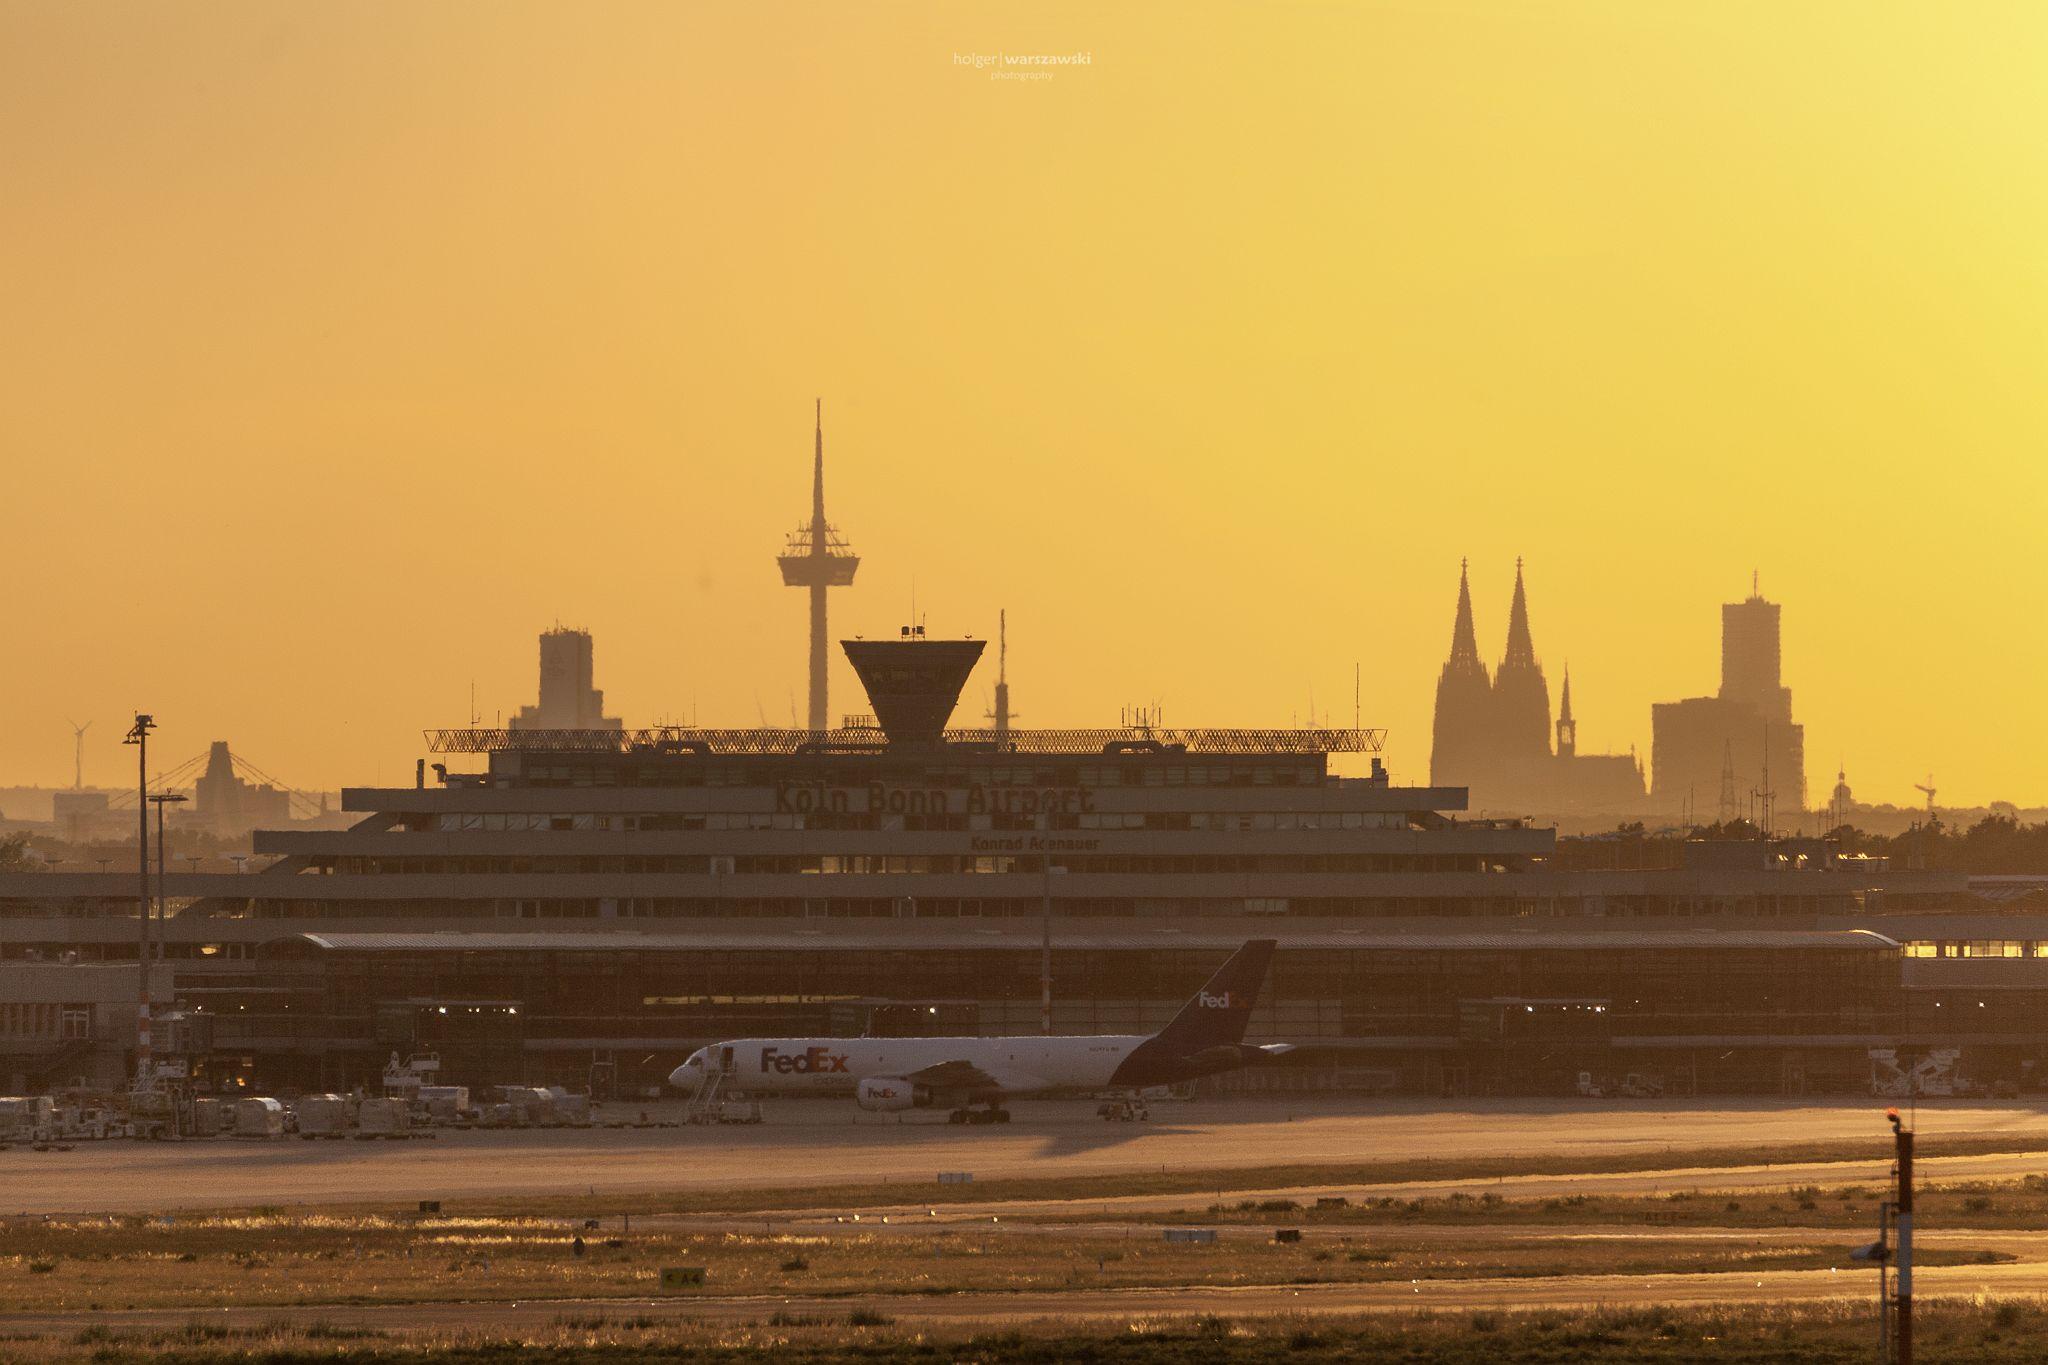 Sommerabend am Köln-Bonn Airport